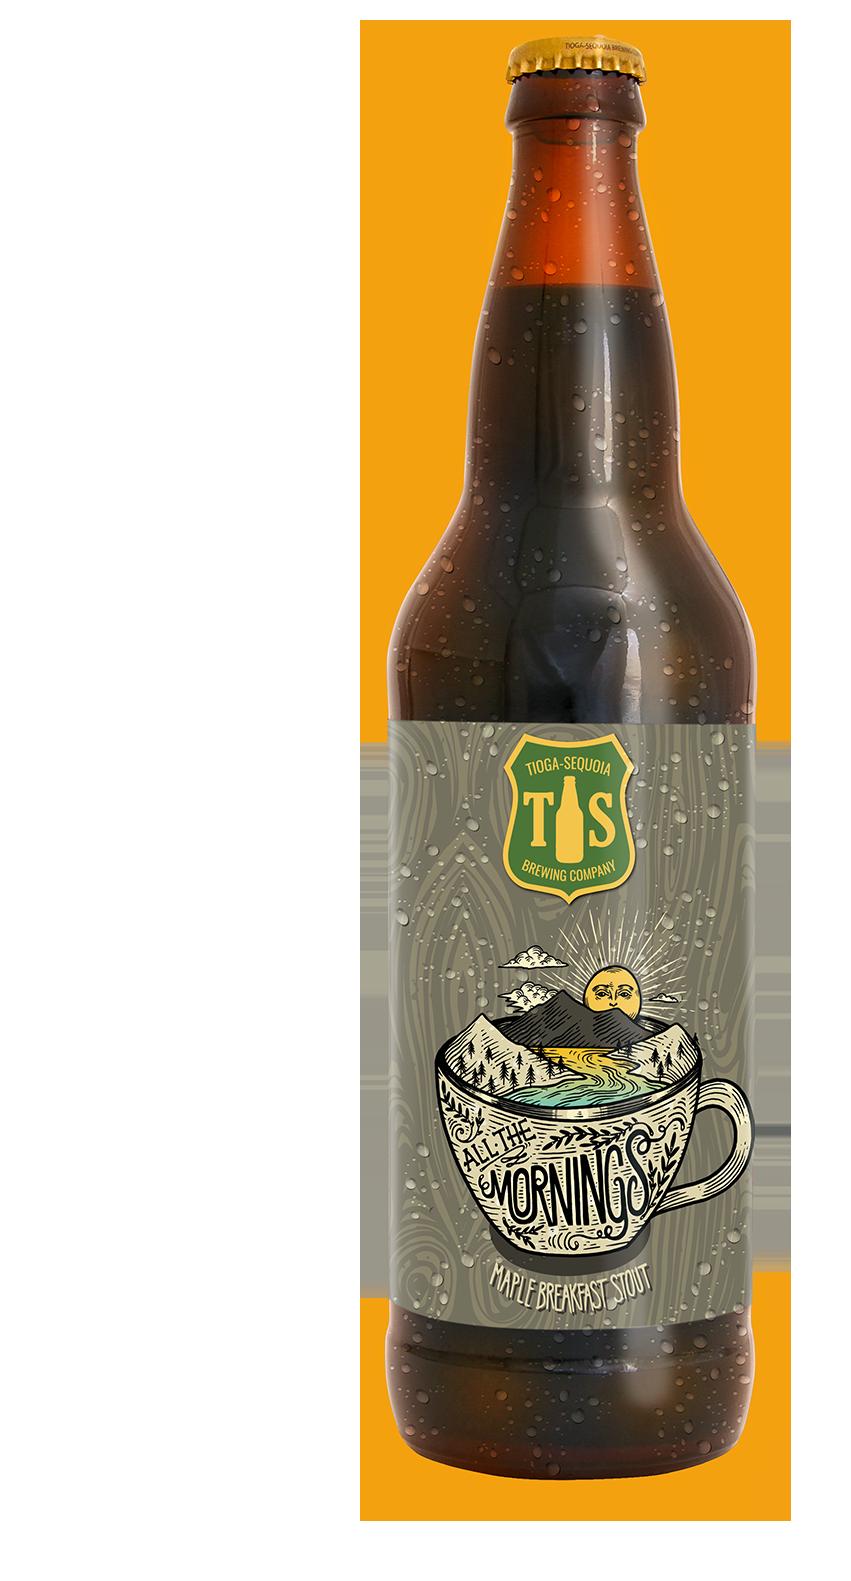 Tioga-Sequoia Beer Portfolio | Tioga-Sequoia Brewery Co